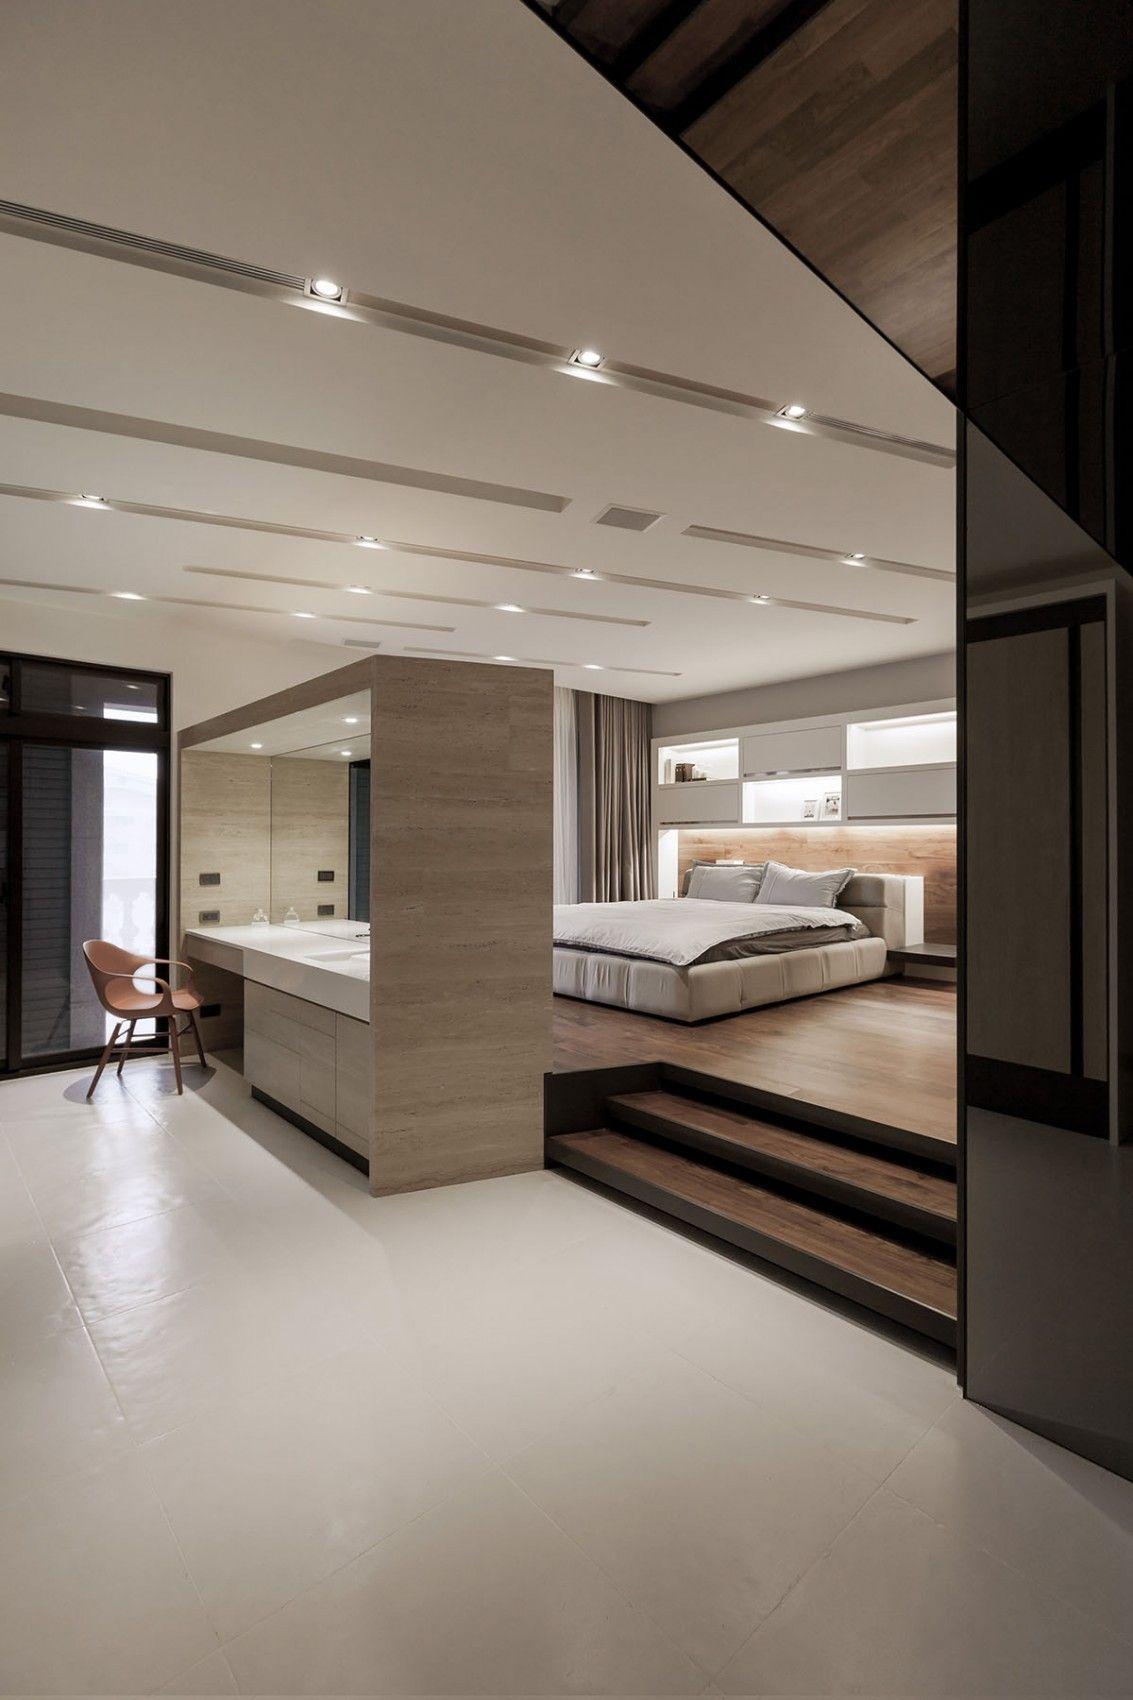 4 room bto master bedroom  Small Smart Studios with Slick Simple Designs  Simple designs